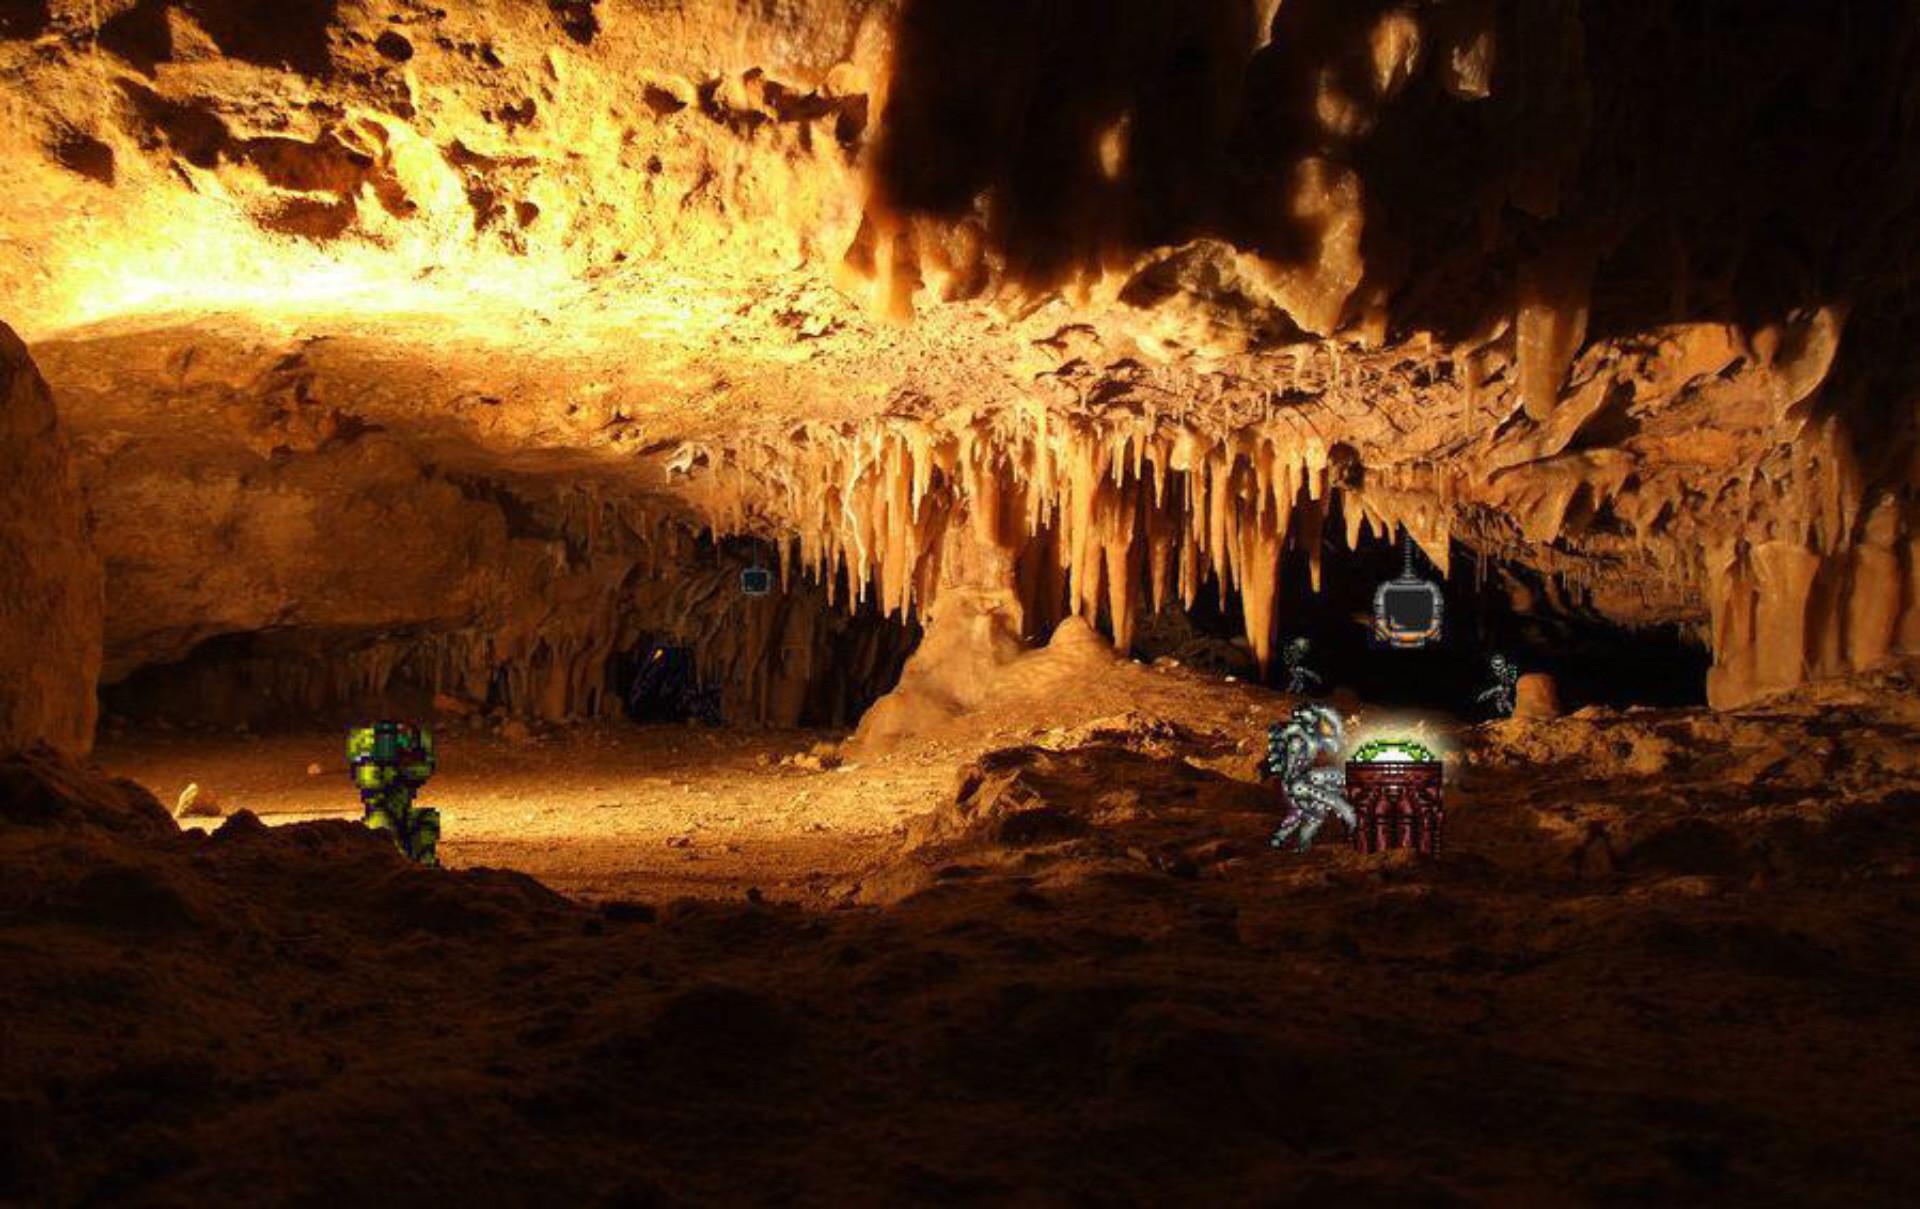 Super Metroid For Real In Cave Wallpaper Artwork